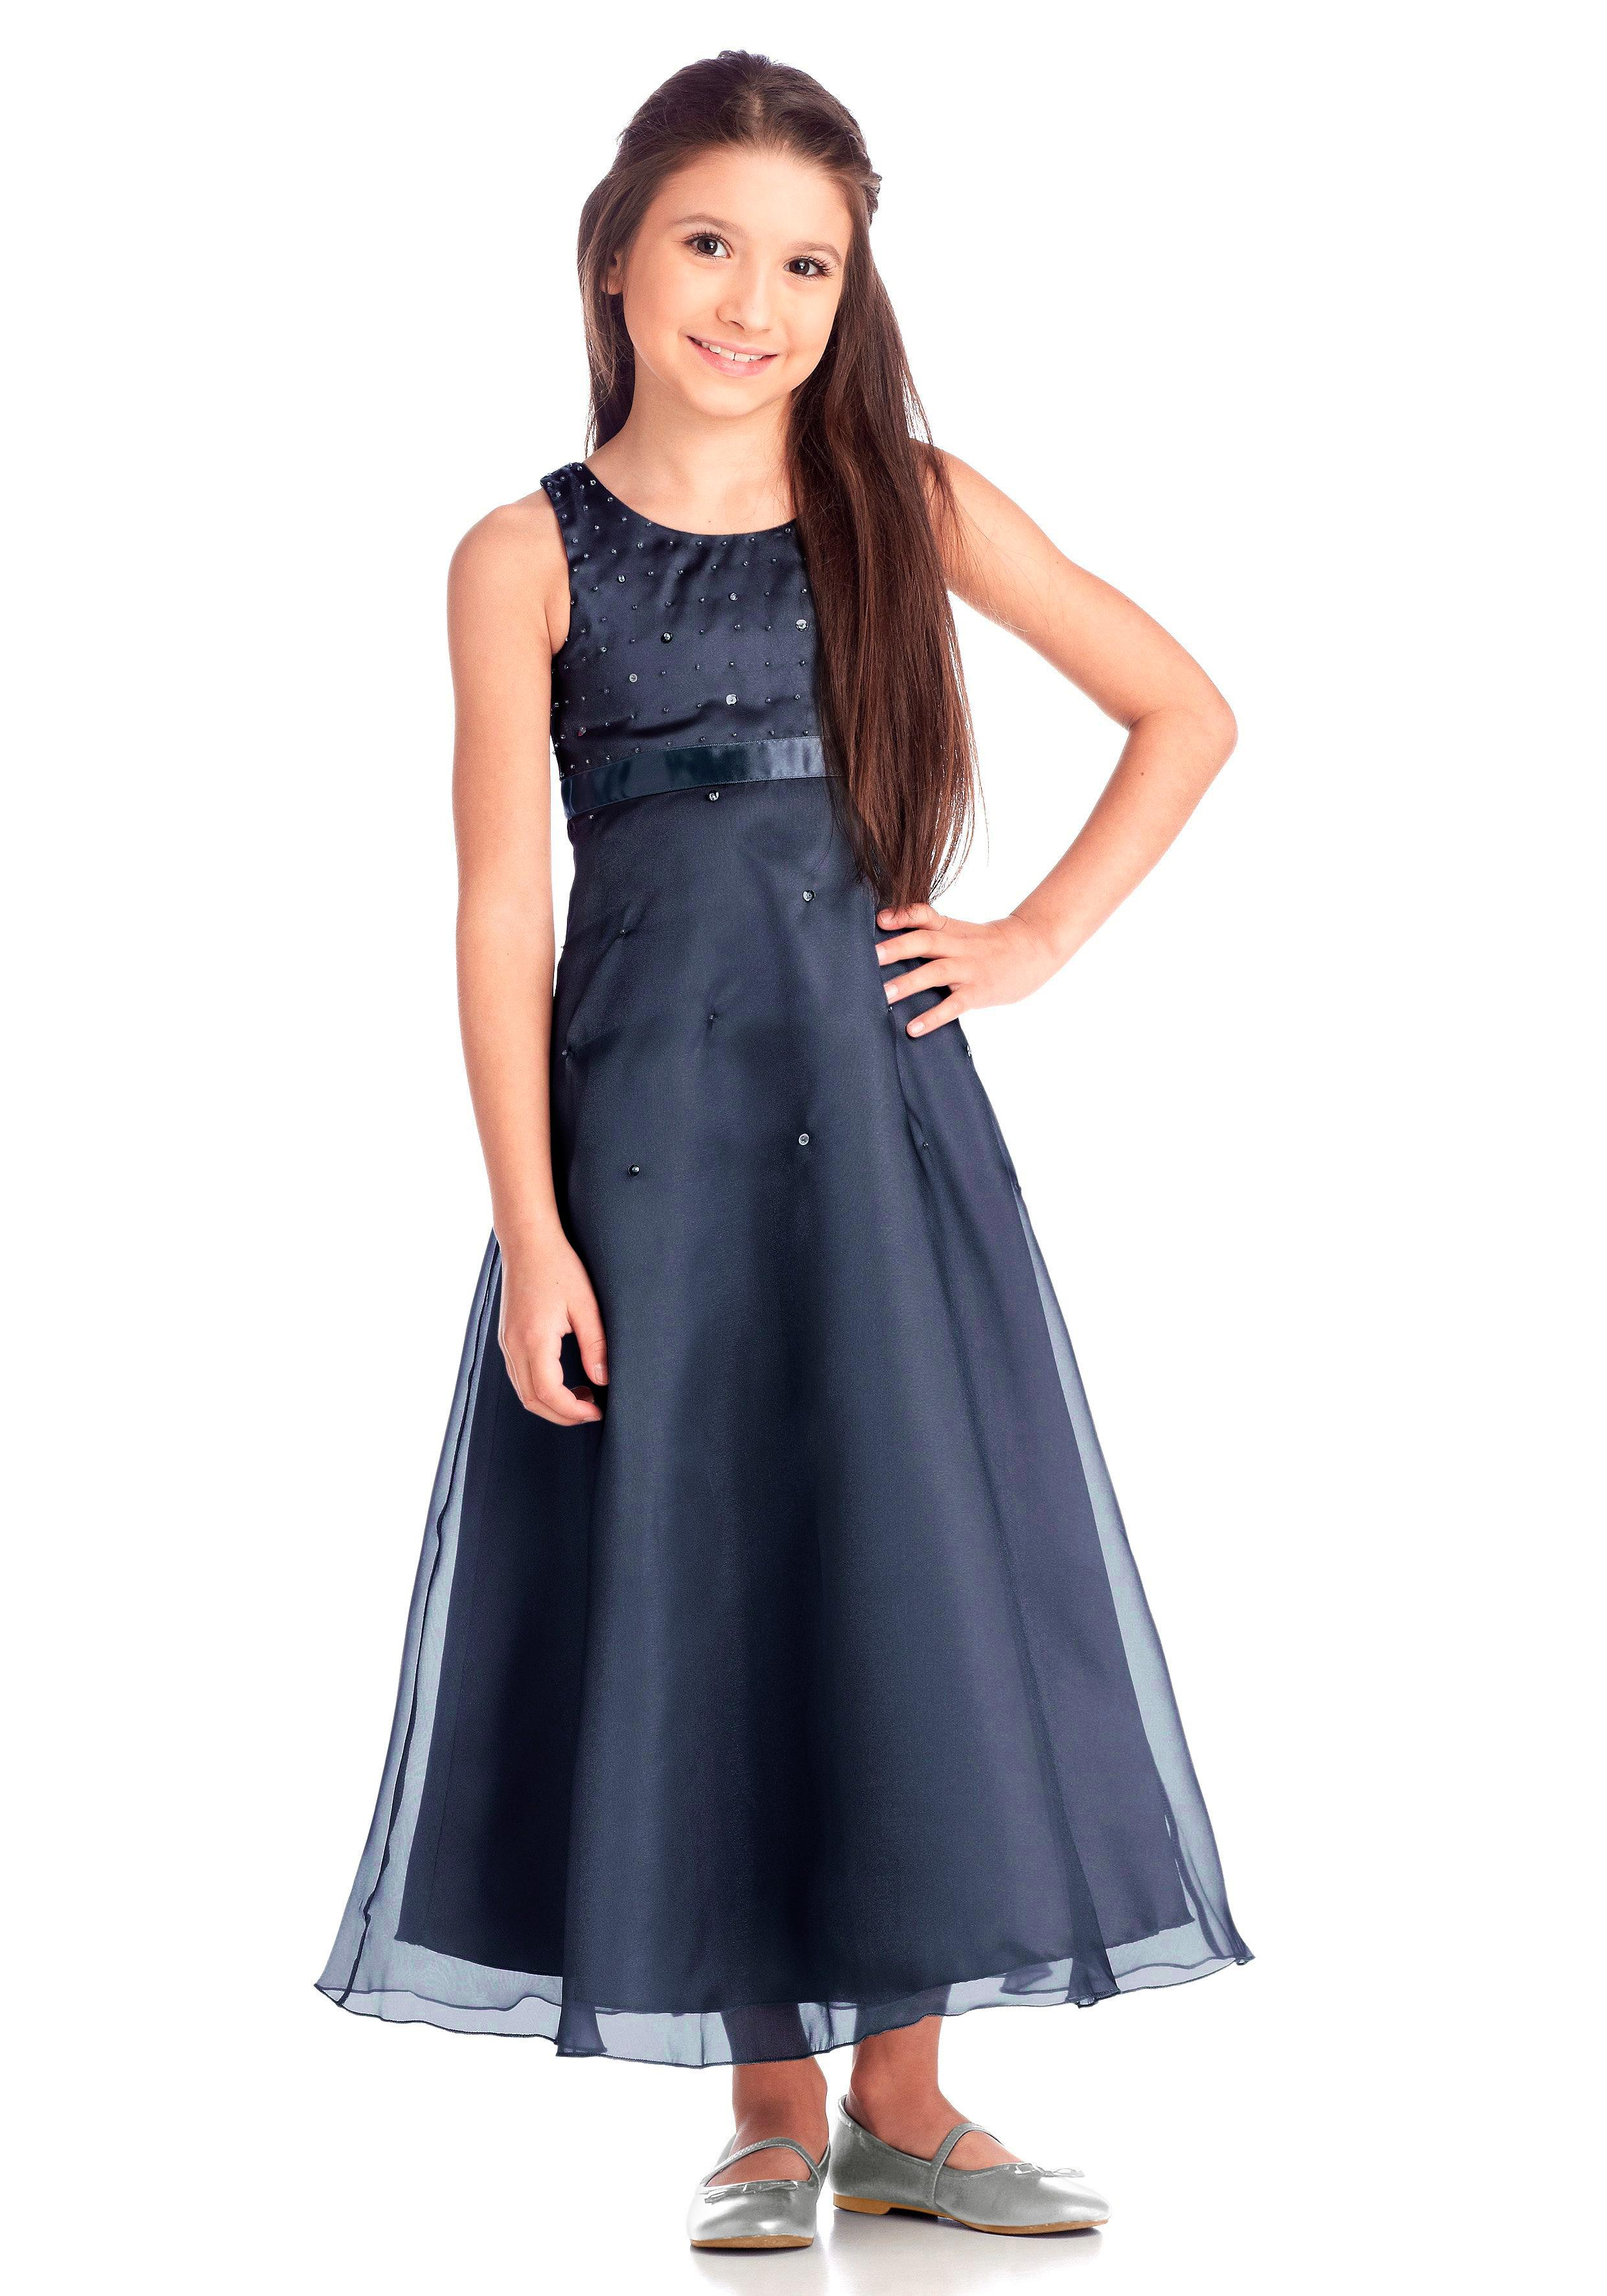 Arizona Satinkleid Kindermode/Bekleidung/Mädchenkleidung/Festliche Mode/Festliche Kleider